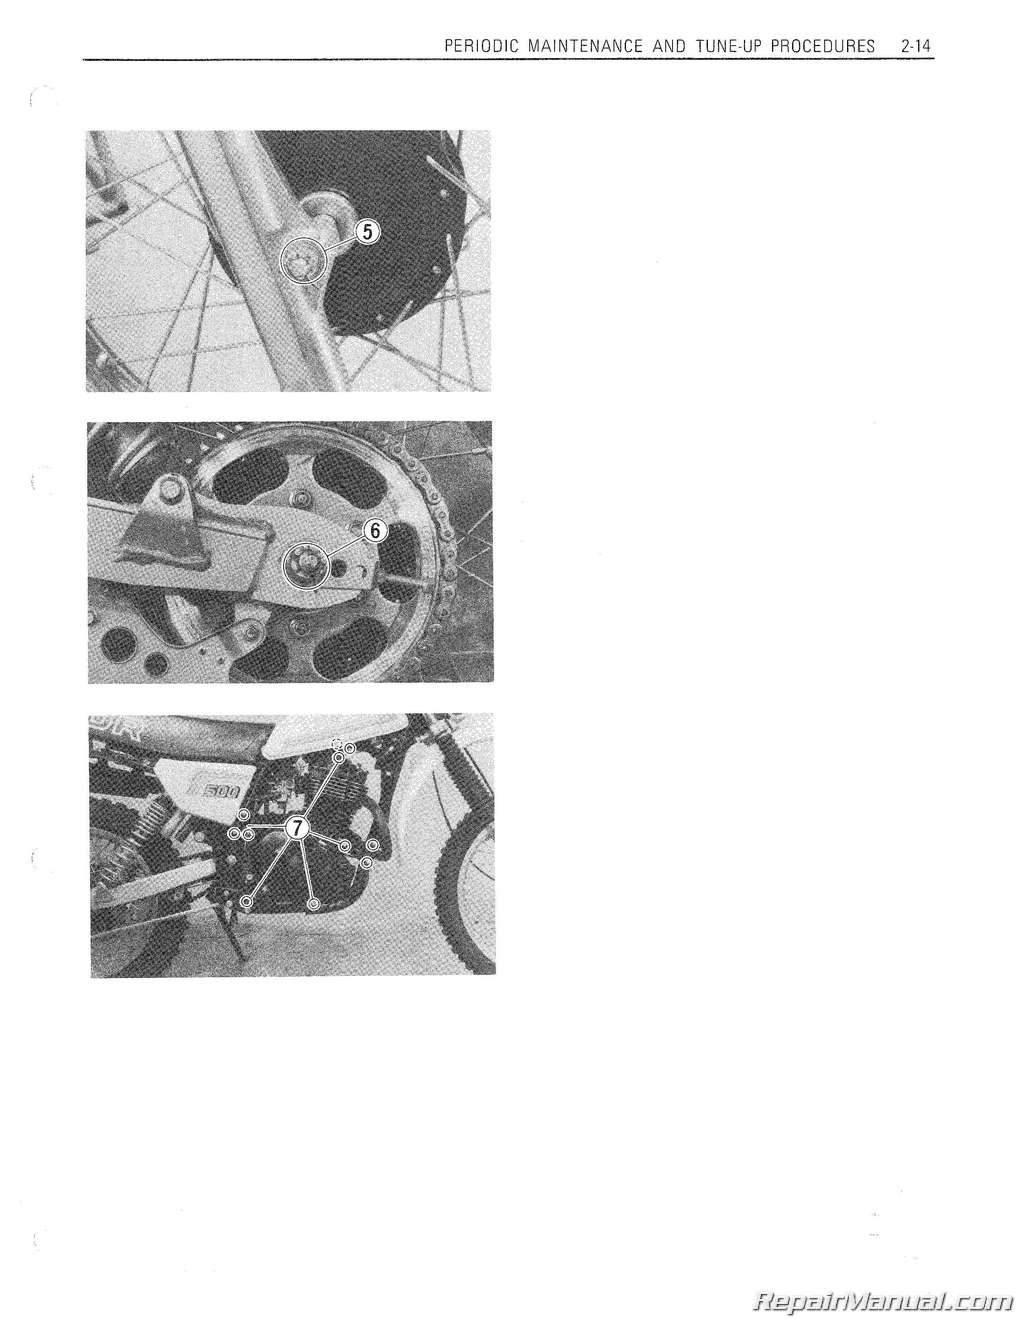 1981-1983 DR500 SP500 Suzuki Motorcycle Printed Service Manual